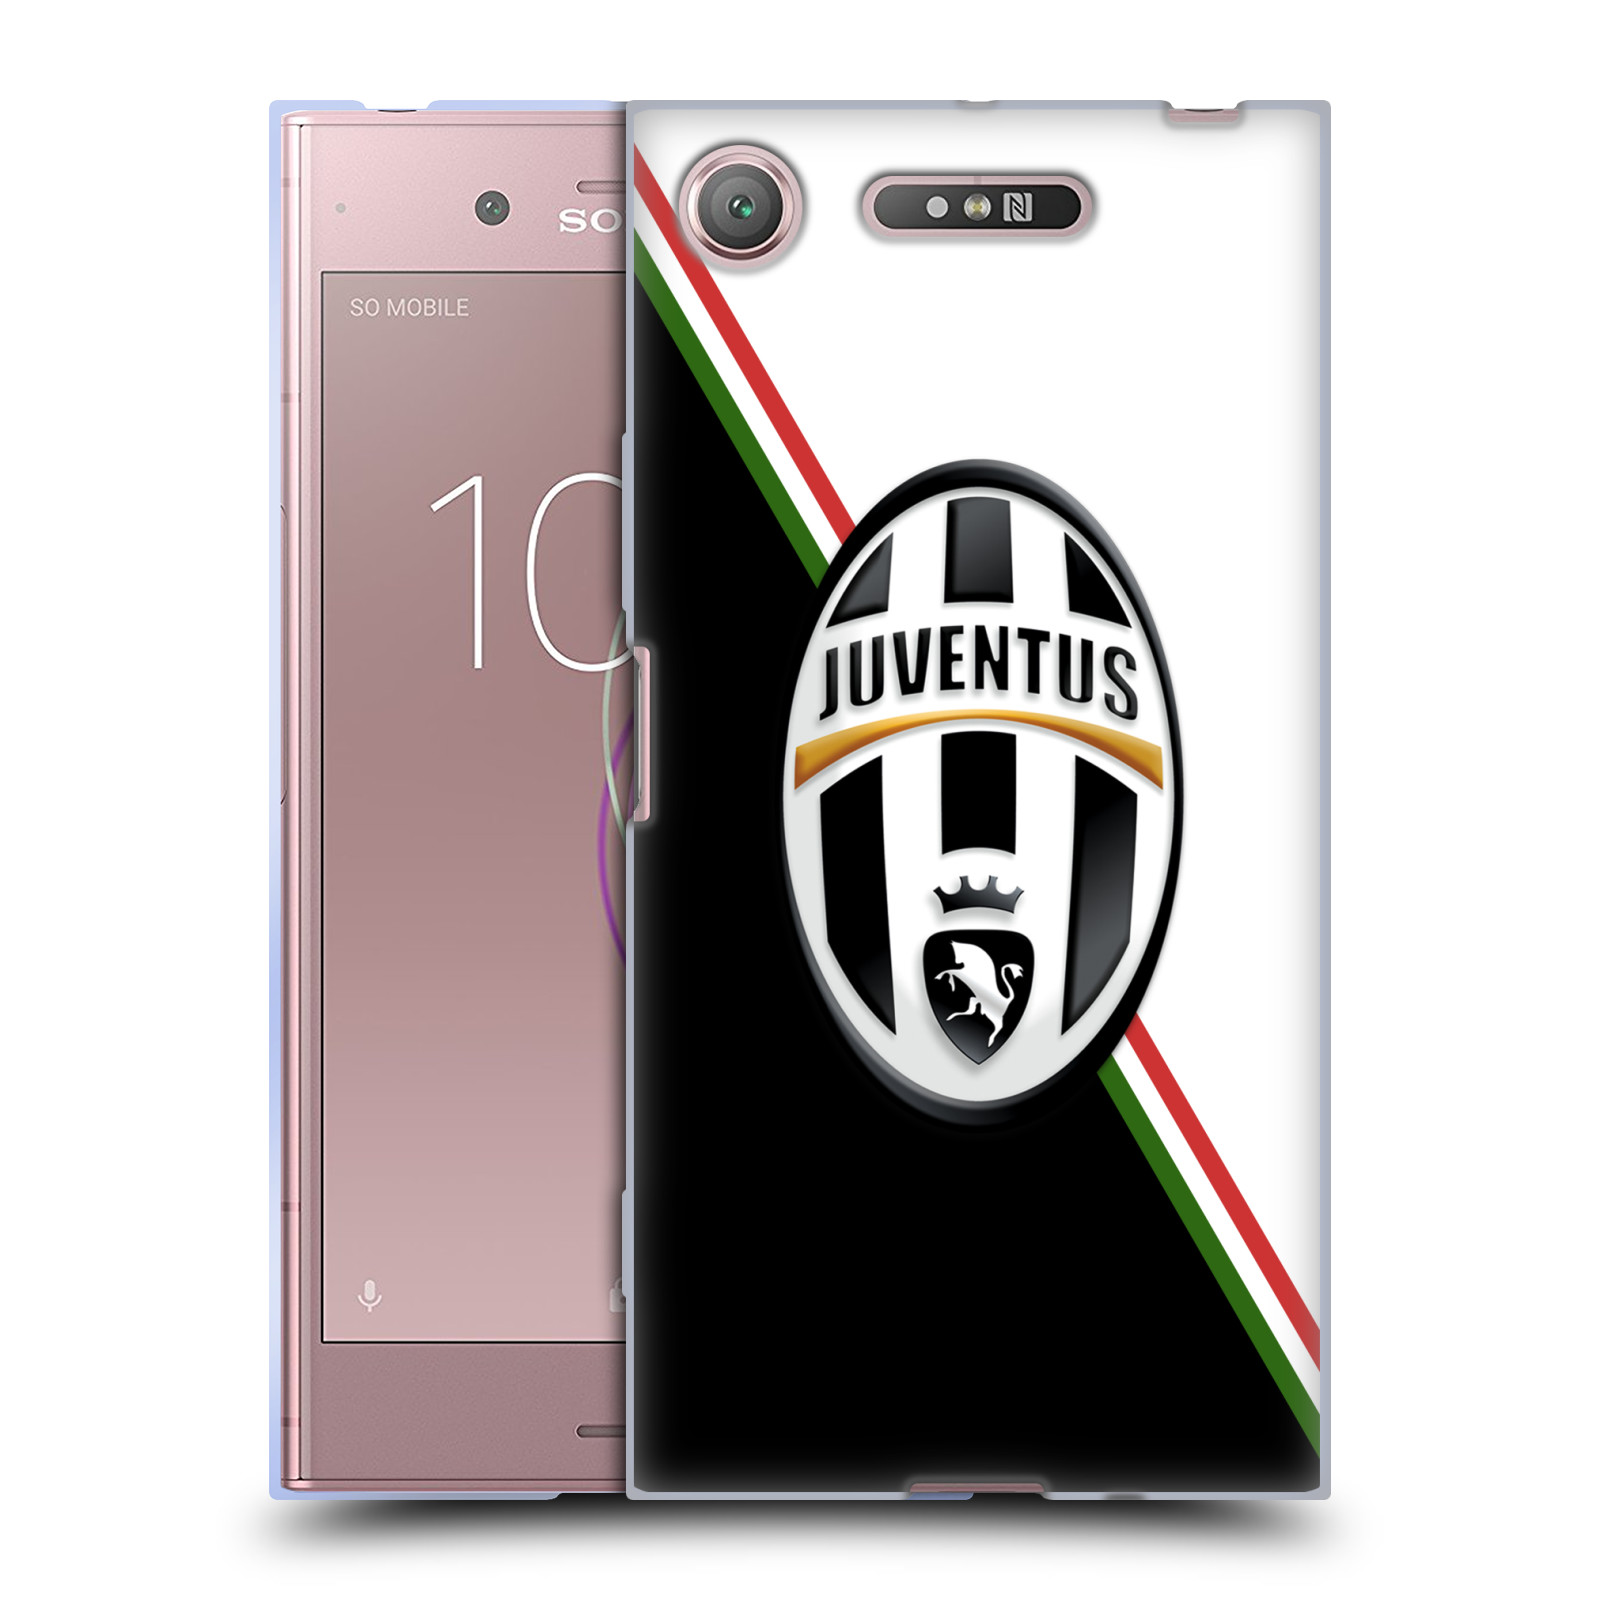 Silikonové pouzdro na mobil Sony Xperia XZ1 - Head Case - Juventus FC - Black and White (Silikonový kryt či obal na mobilní telefon Sony Xperia XZ1 (G8342 Dual Sim / G8341 Single Sim) s motivem Juventus FC - Black and White)